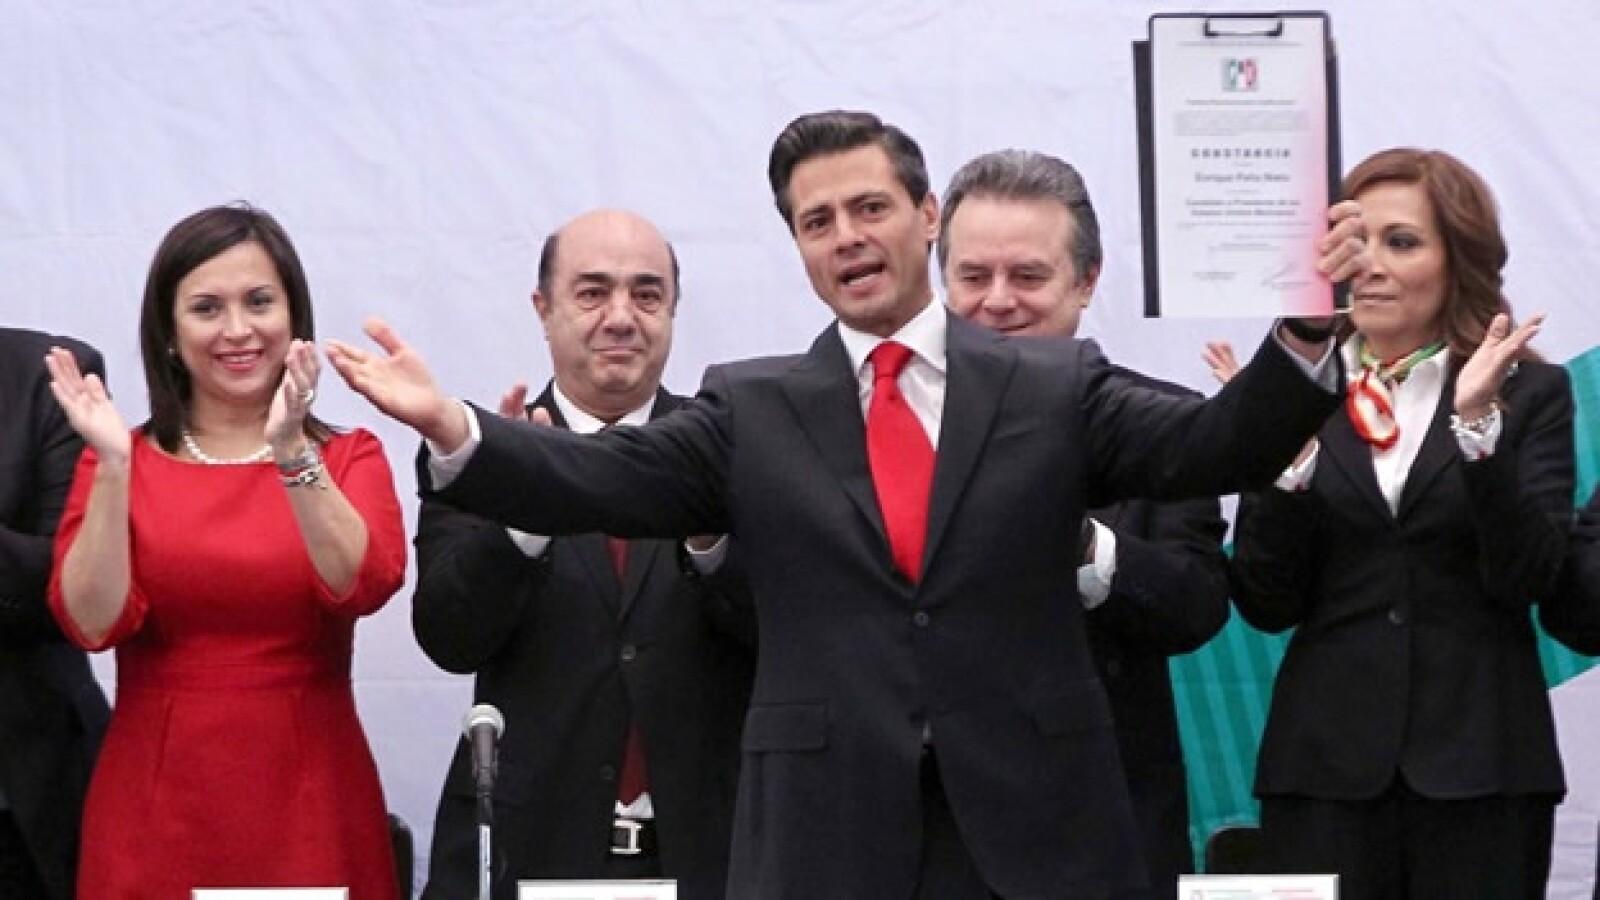 El PRI le da a Peña Nieto la constancia como candidato unico a la presidencia